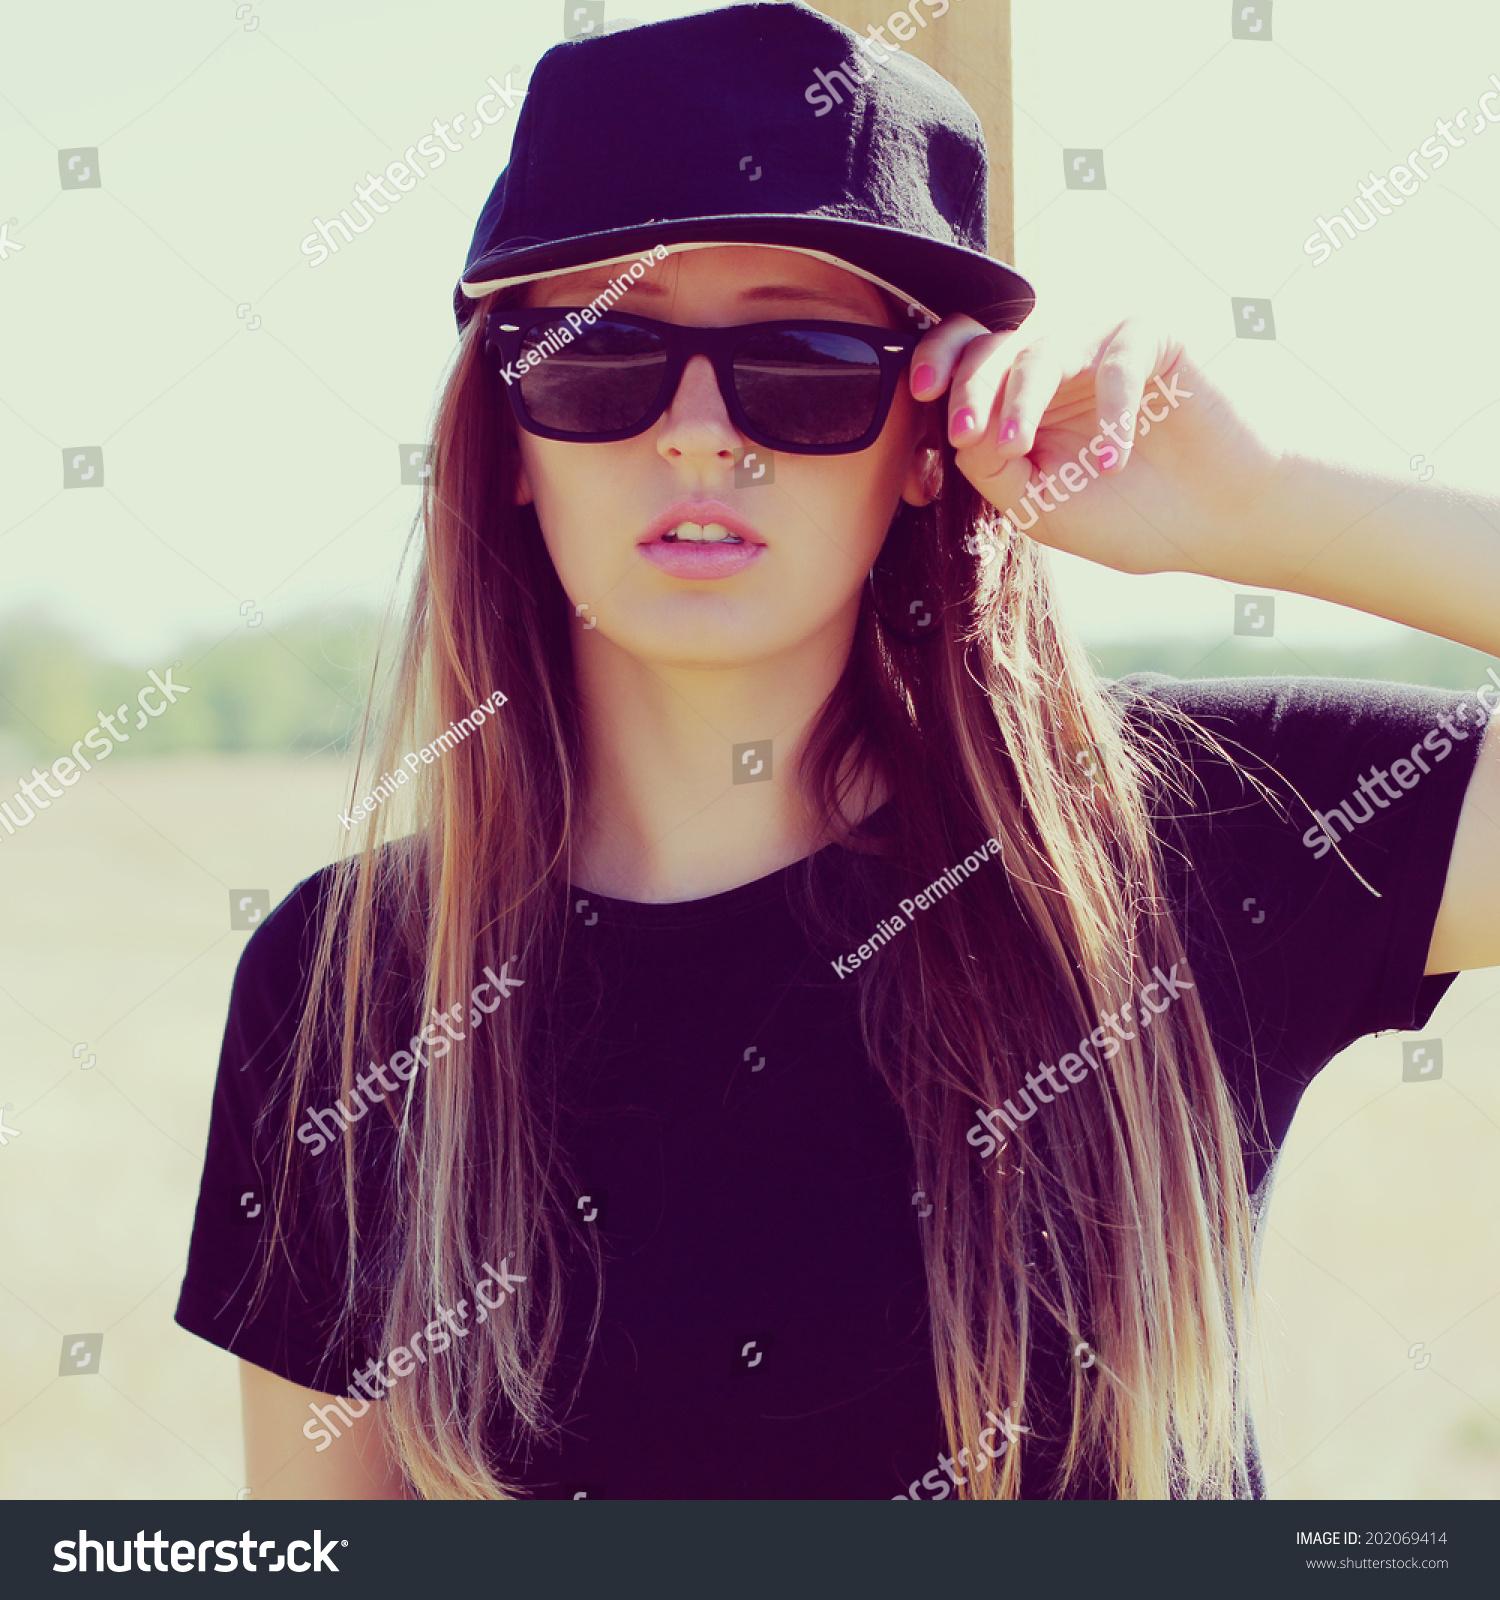 HD wallpapers urban summer hairstyles